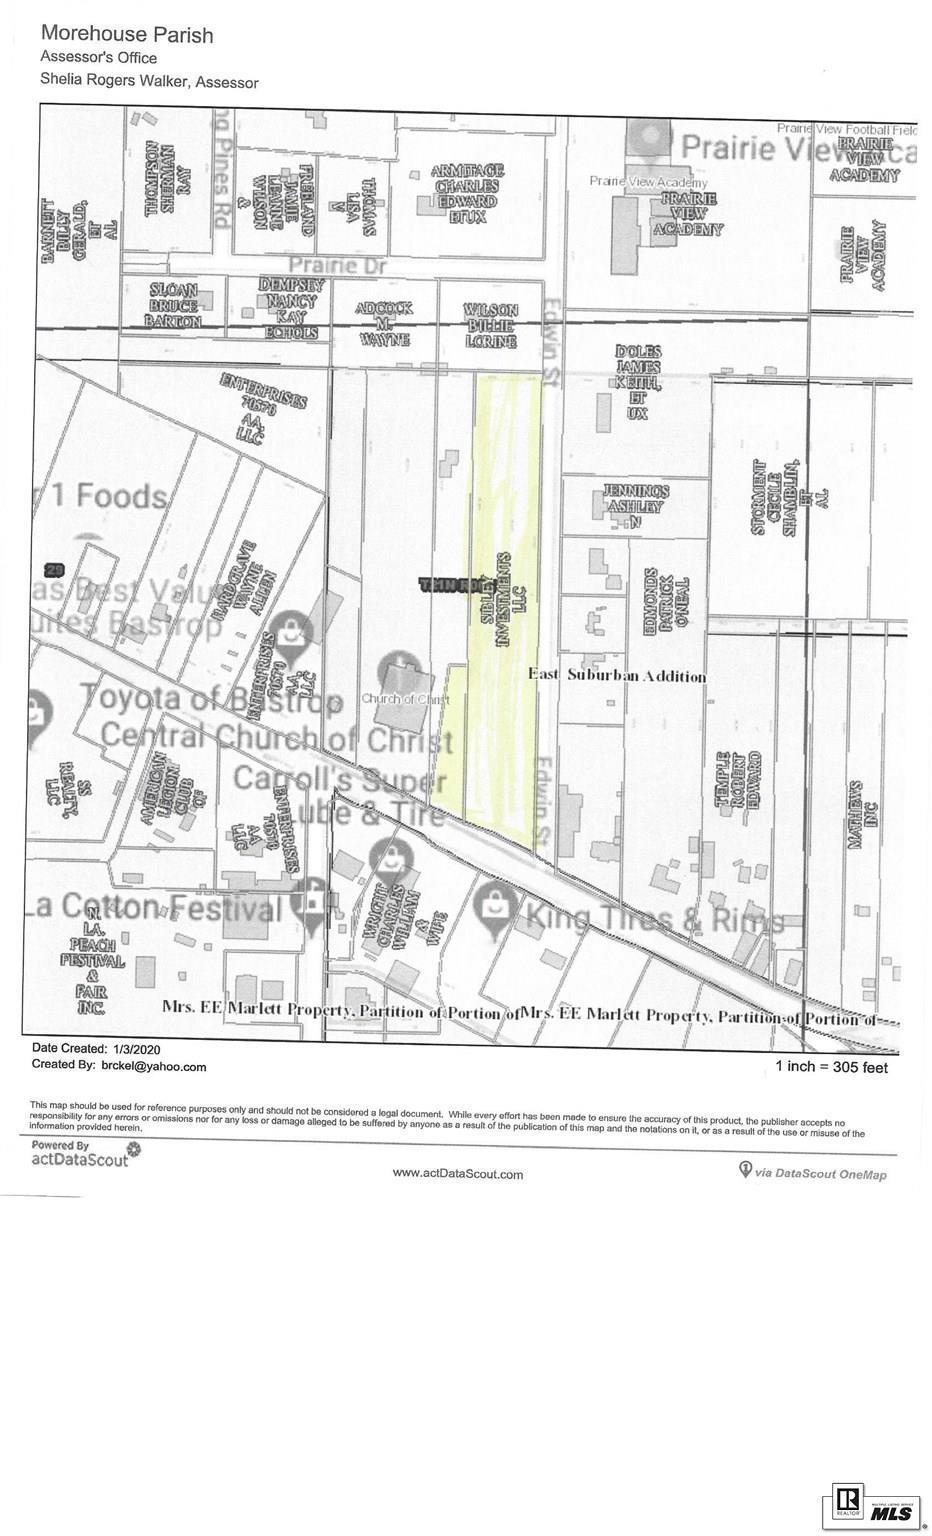 5759 MER ROUGE ROAD, 501 Bastrop & Morehouse Parish